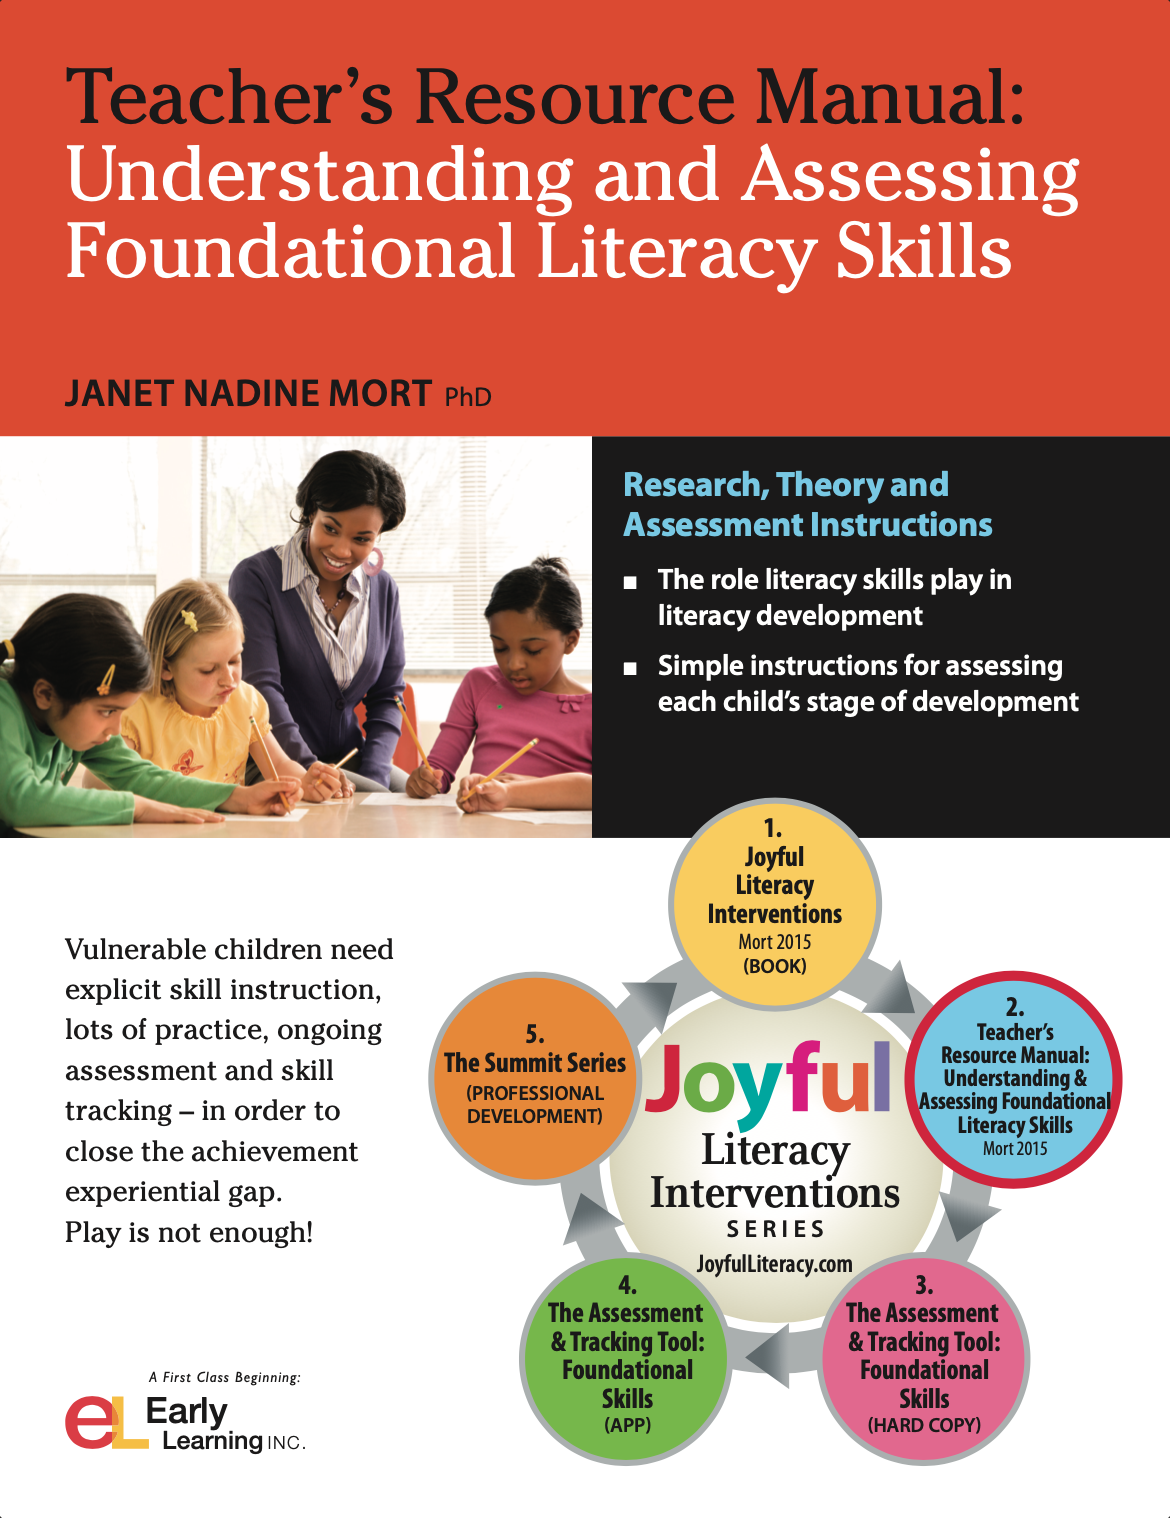 Joyful Literacy Interventions Cover